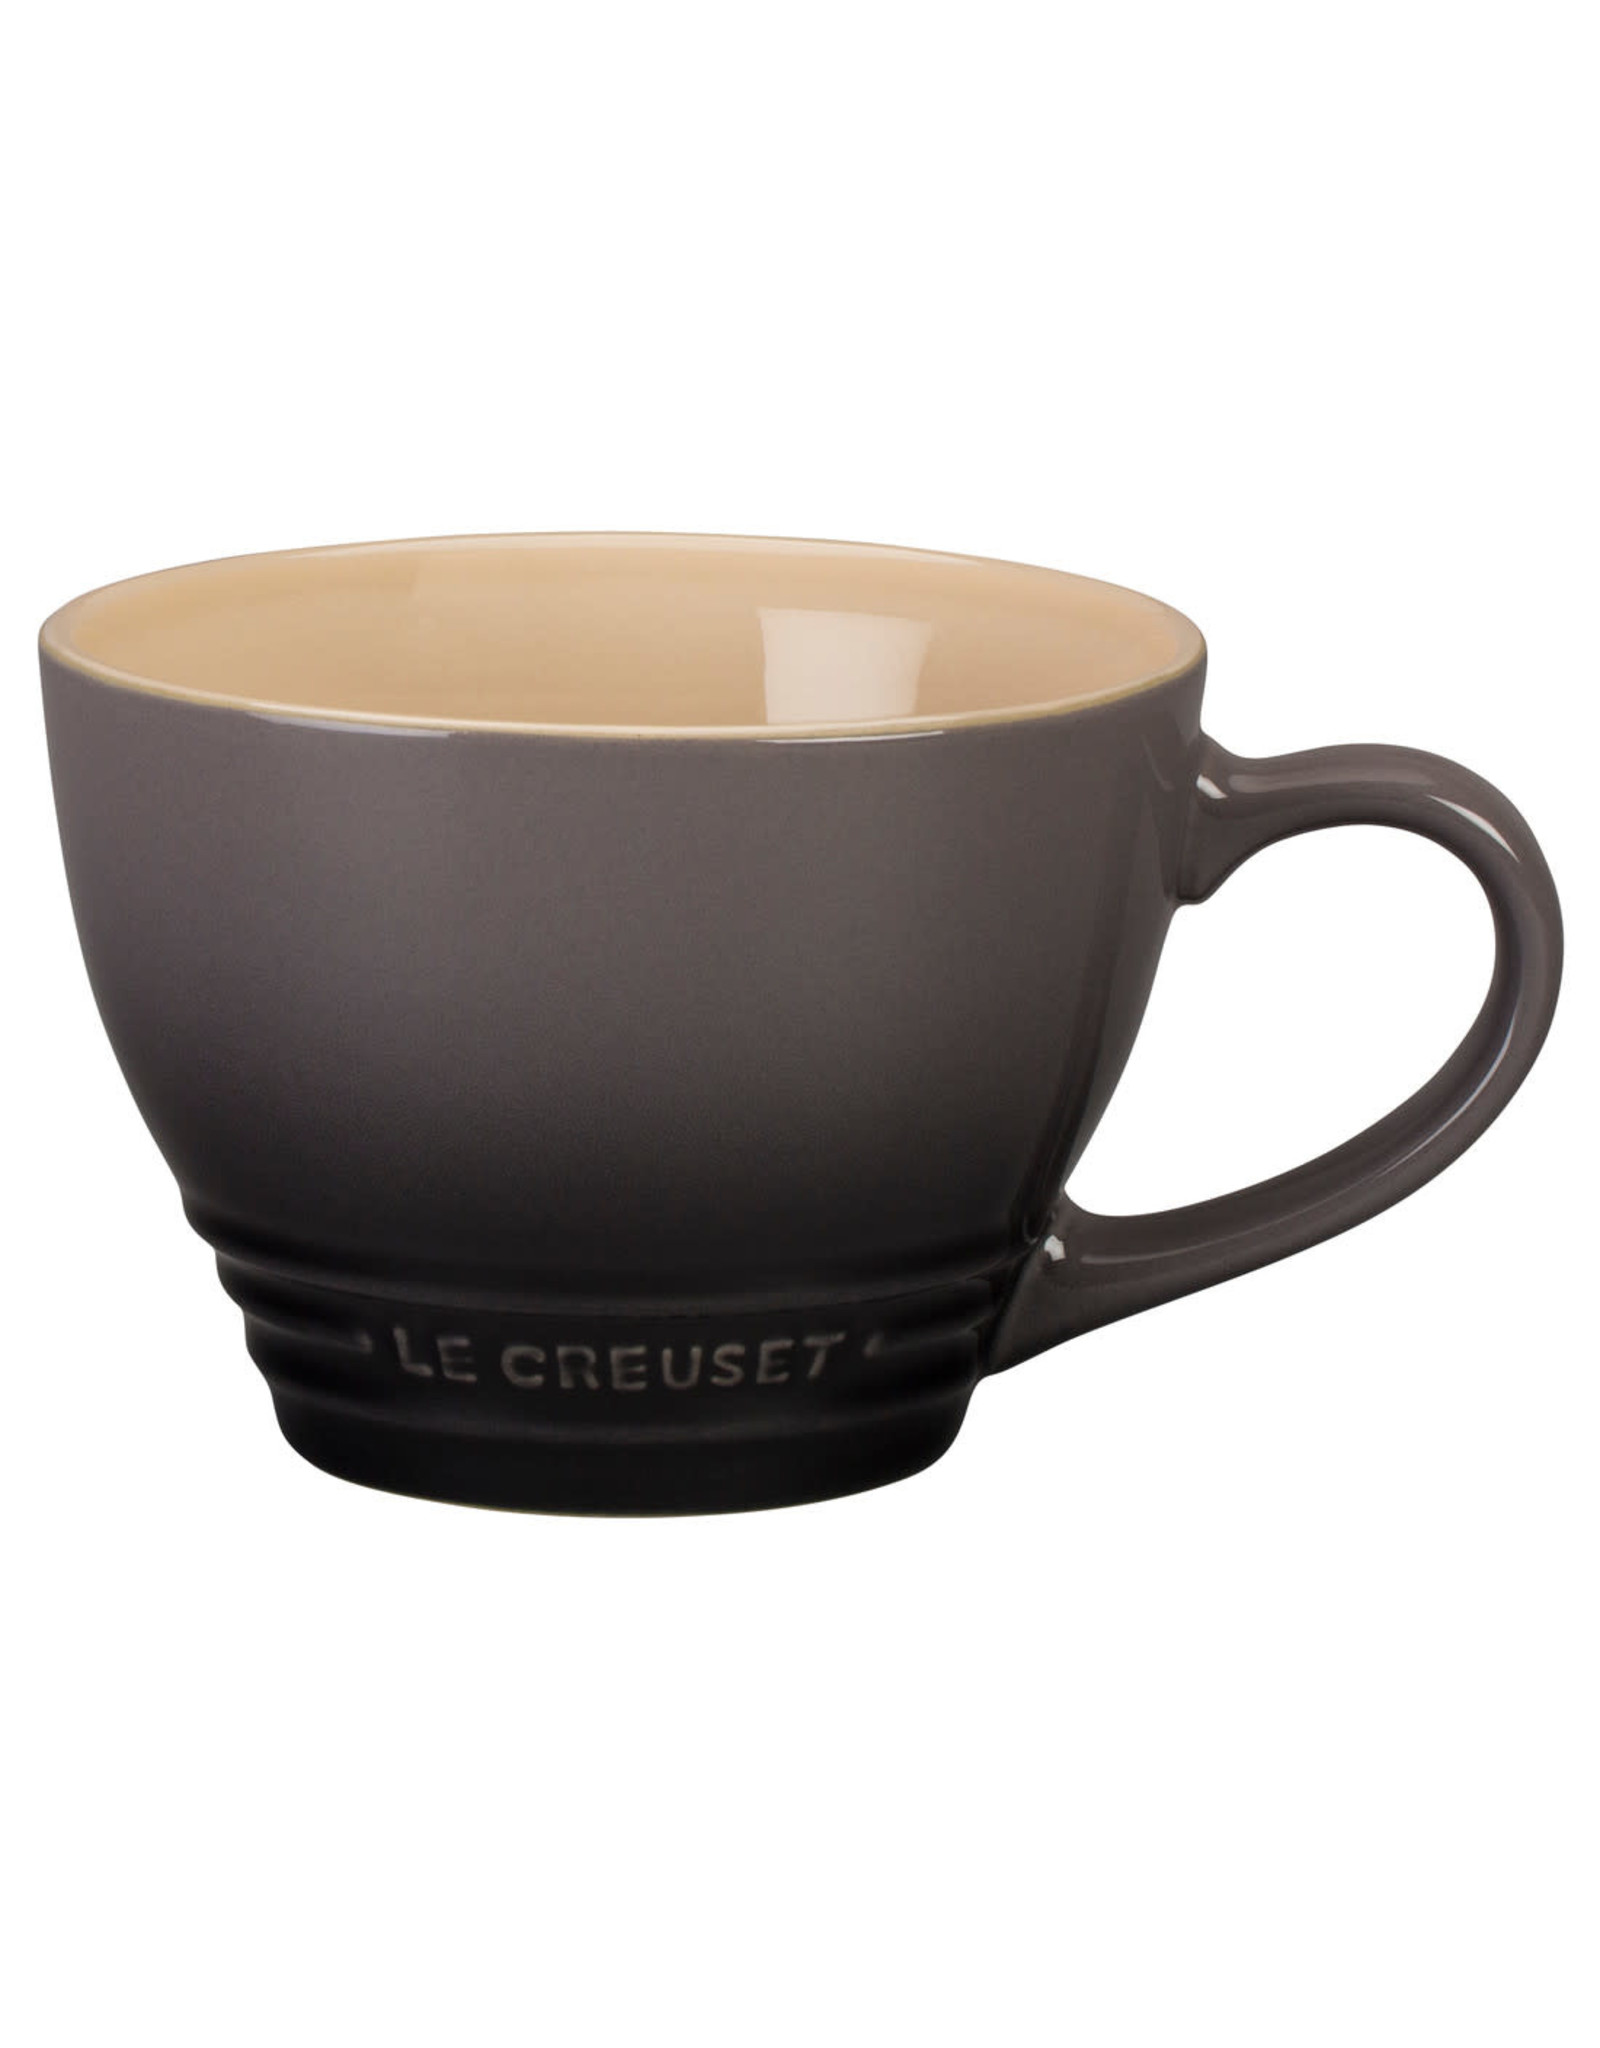 Le Creuset Le Creuset 14oz Bistro Mug - Oyster